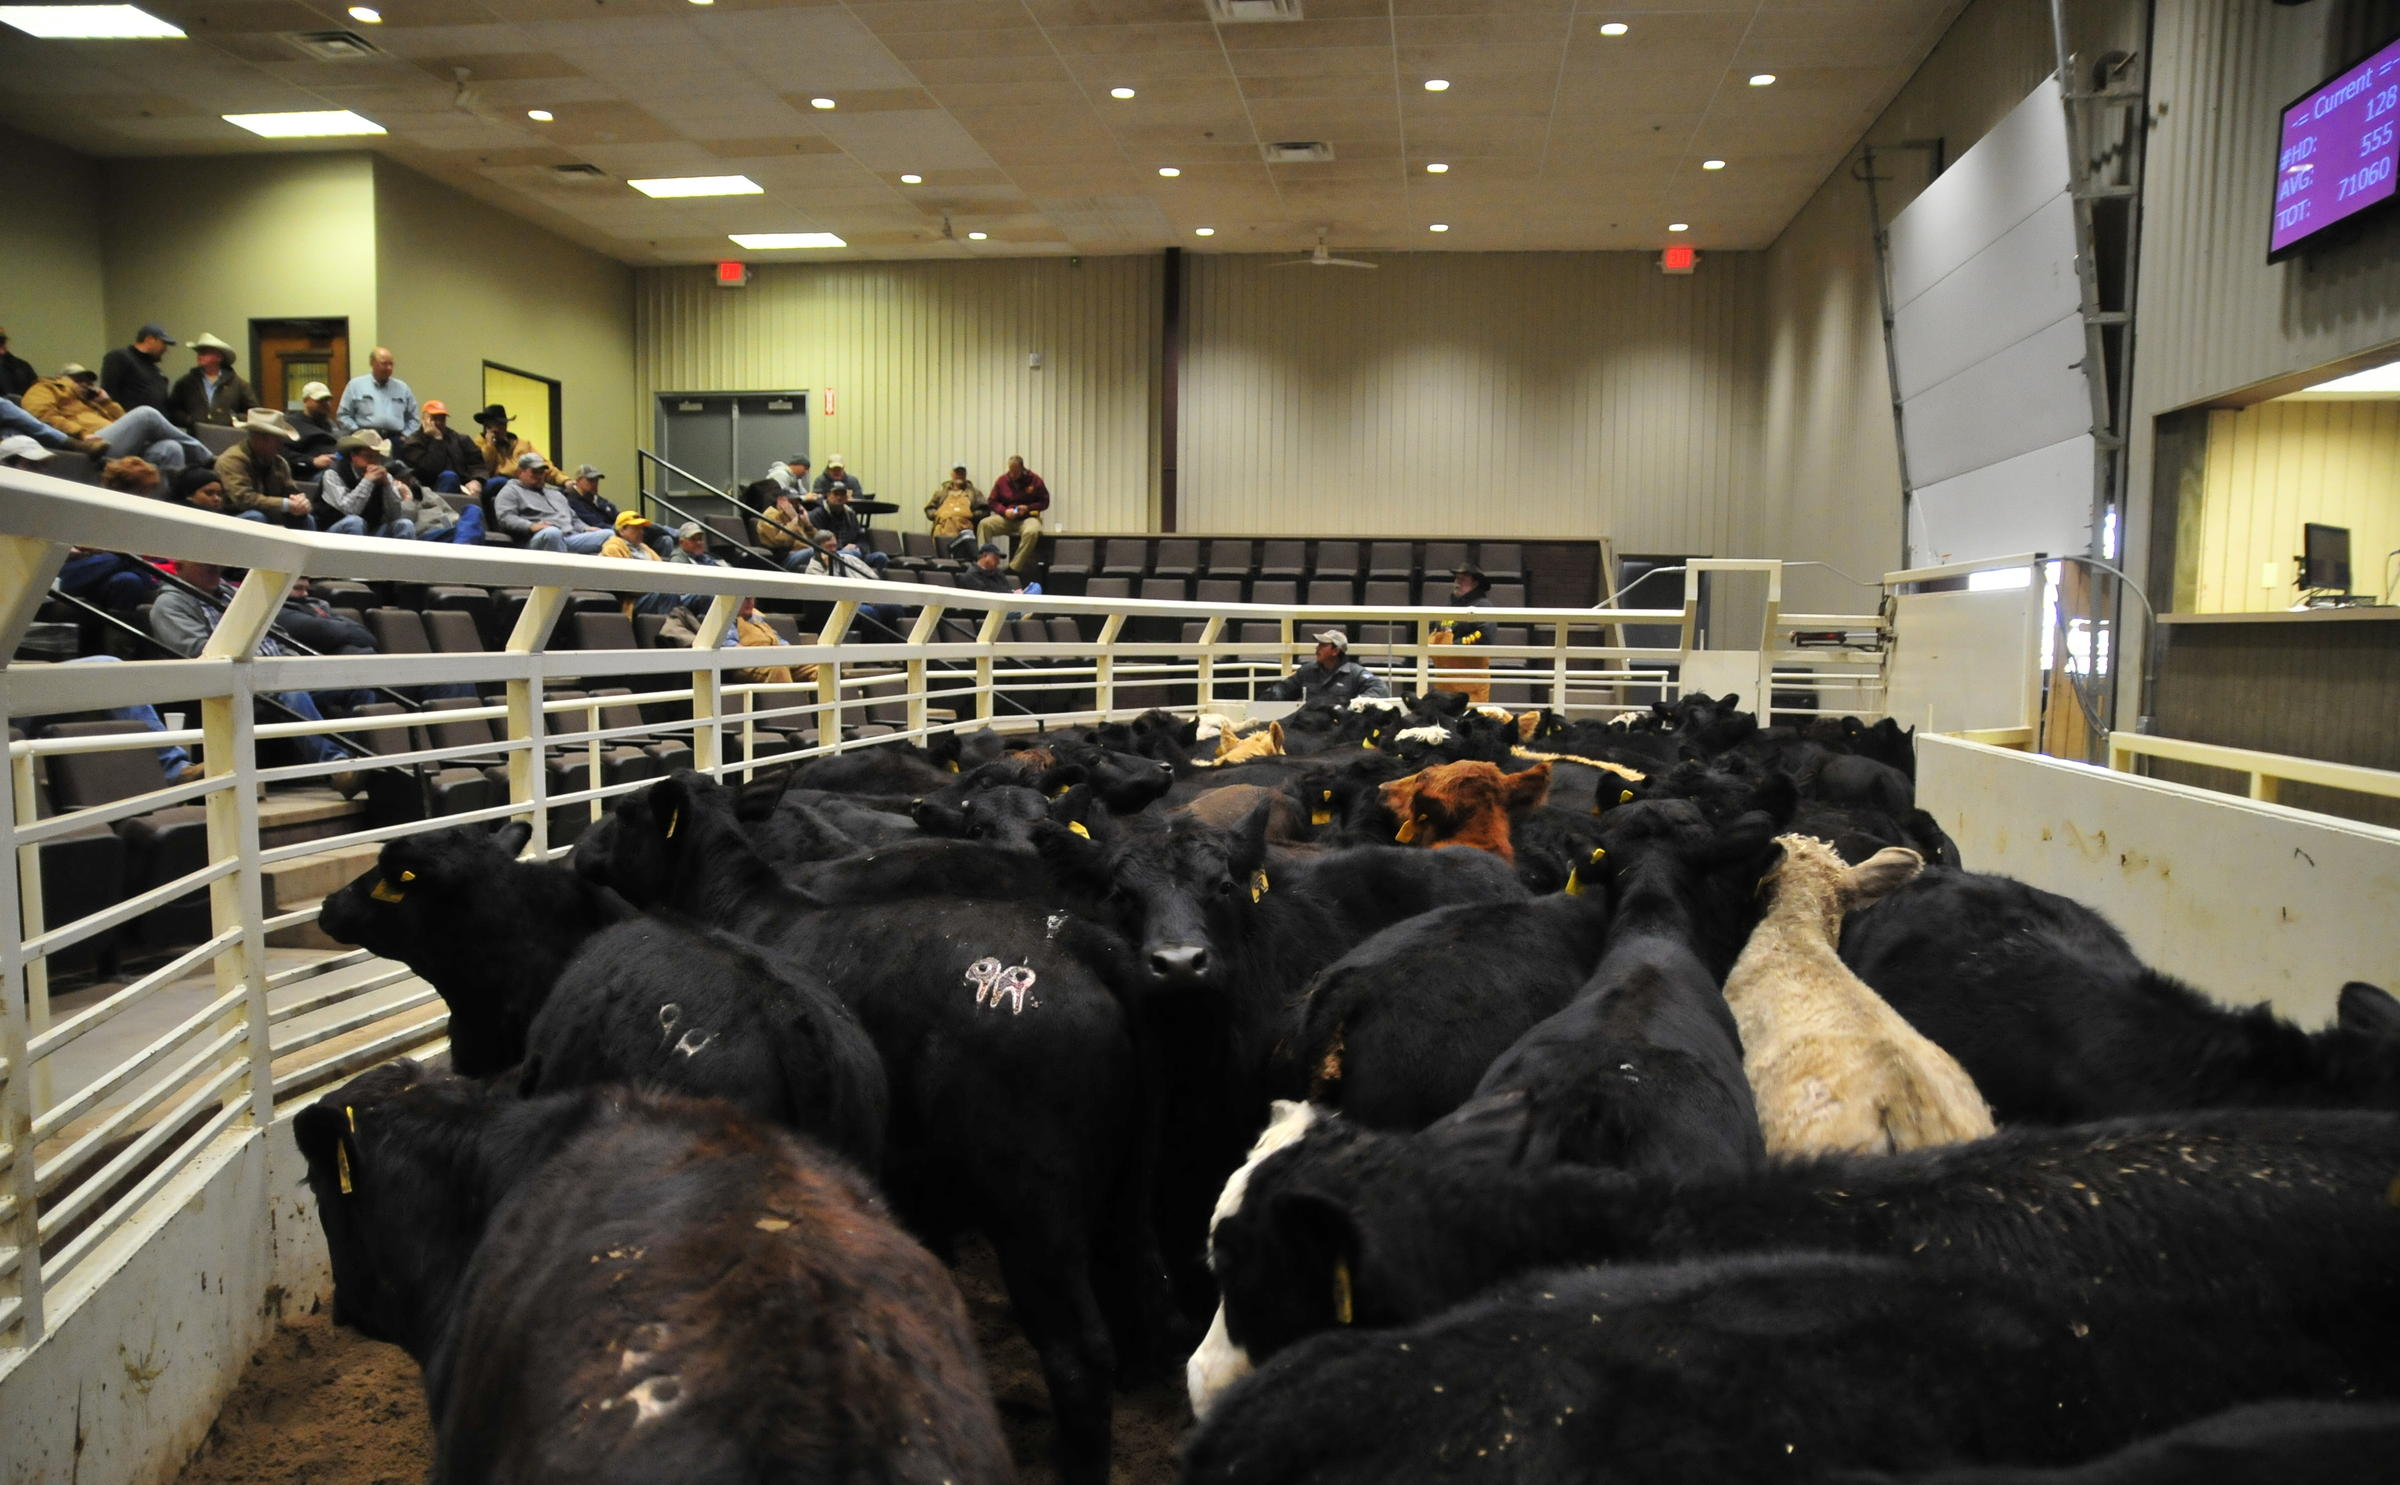 livestock auctions: